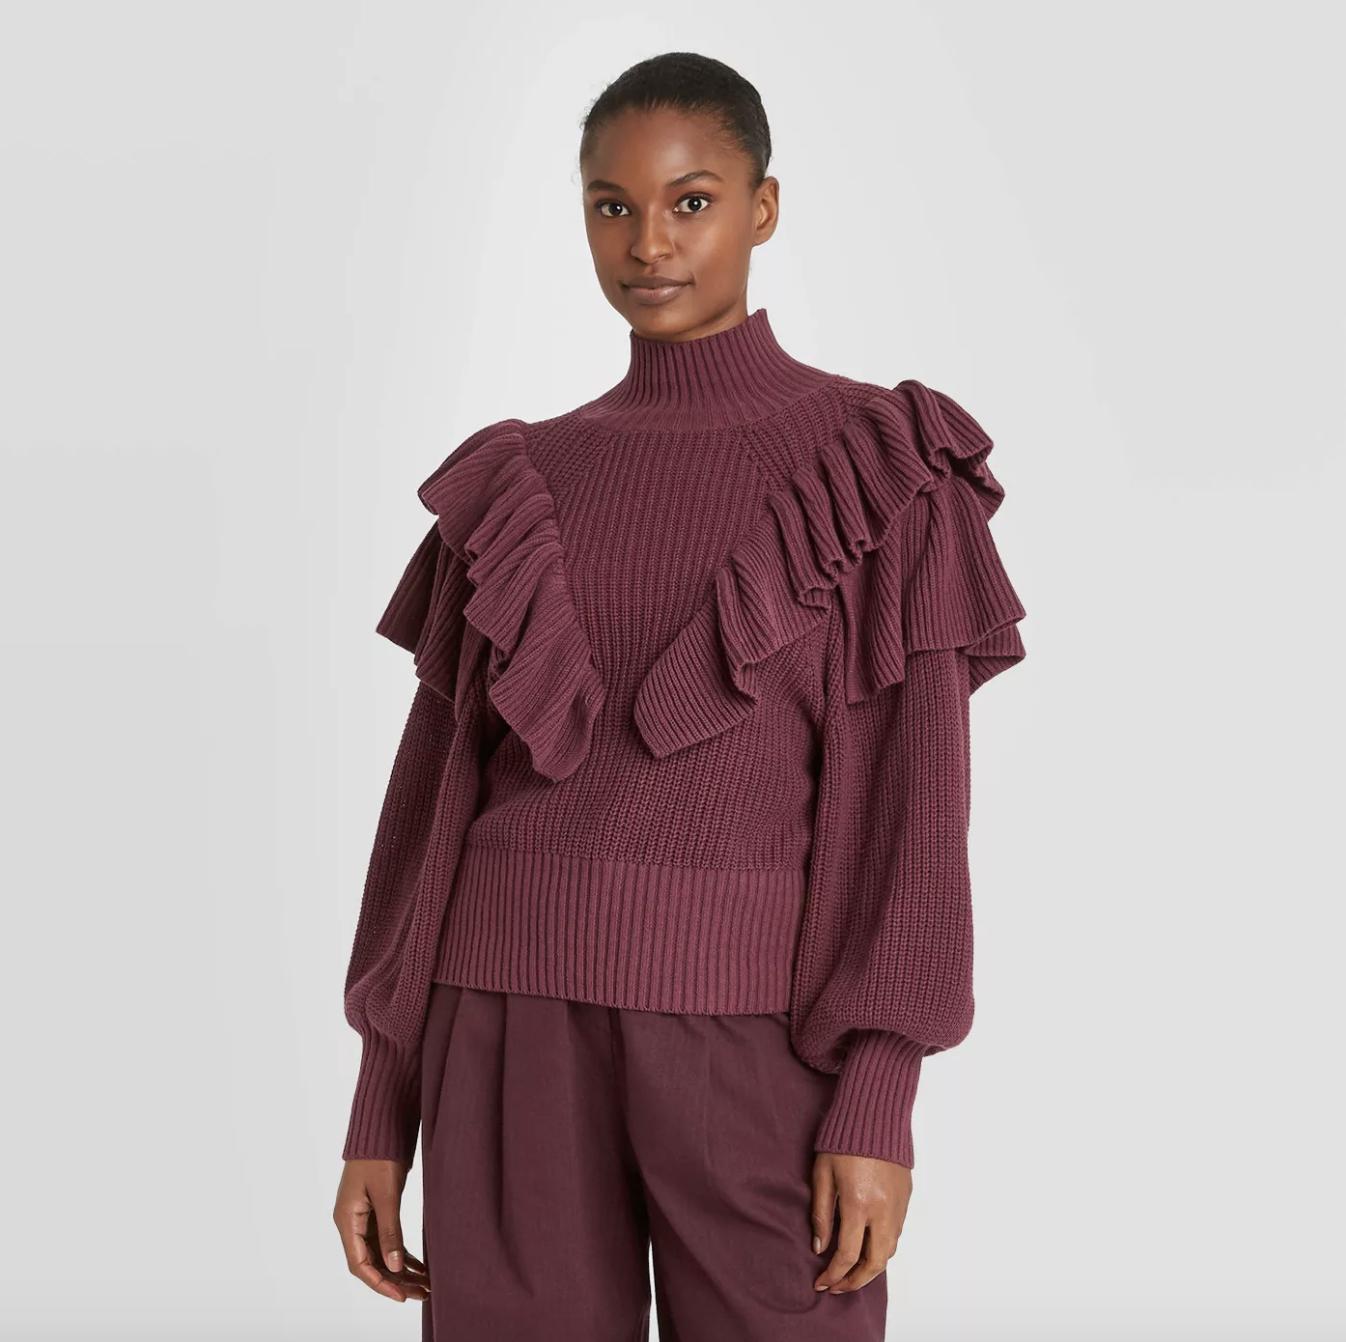 model wearing the ruffle sweater in burgundy